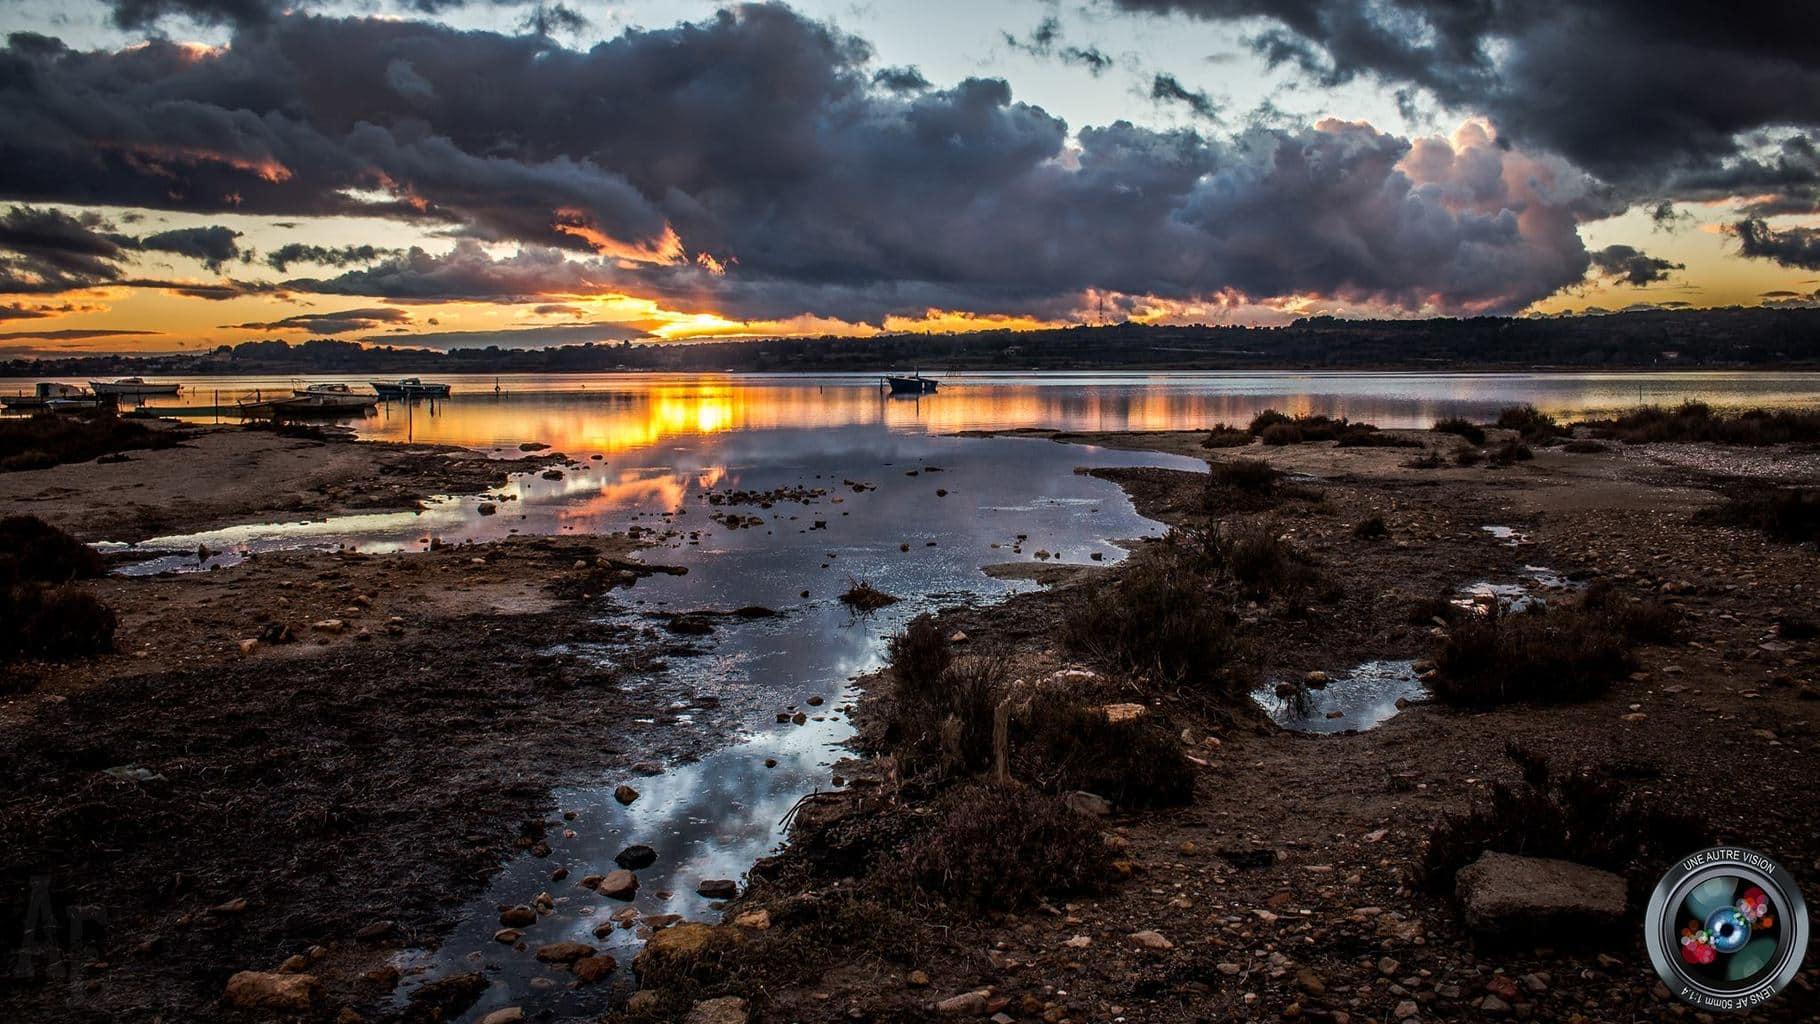 Spectacular sunset | Balaruc le Vieux, France